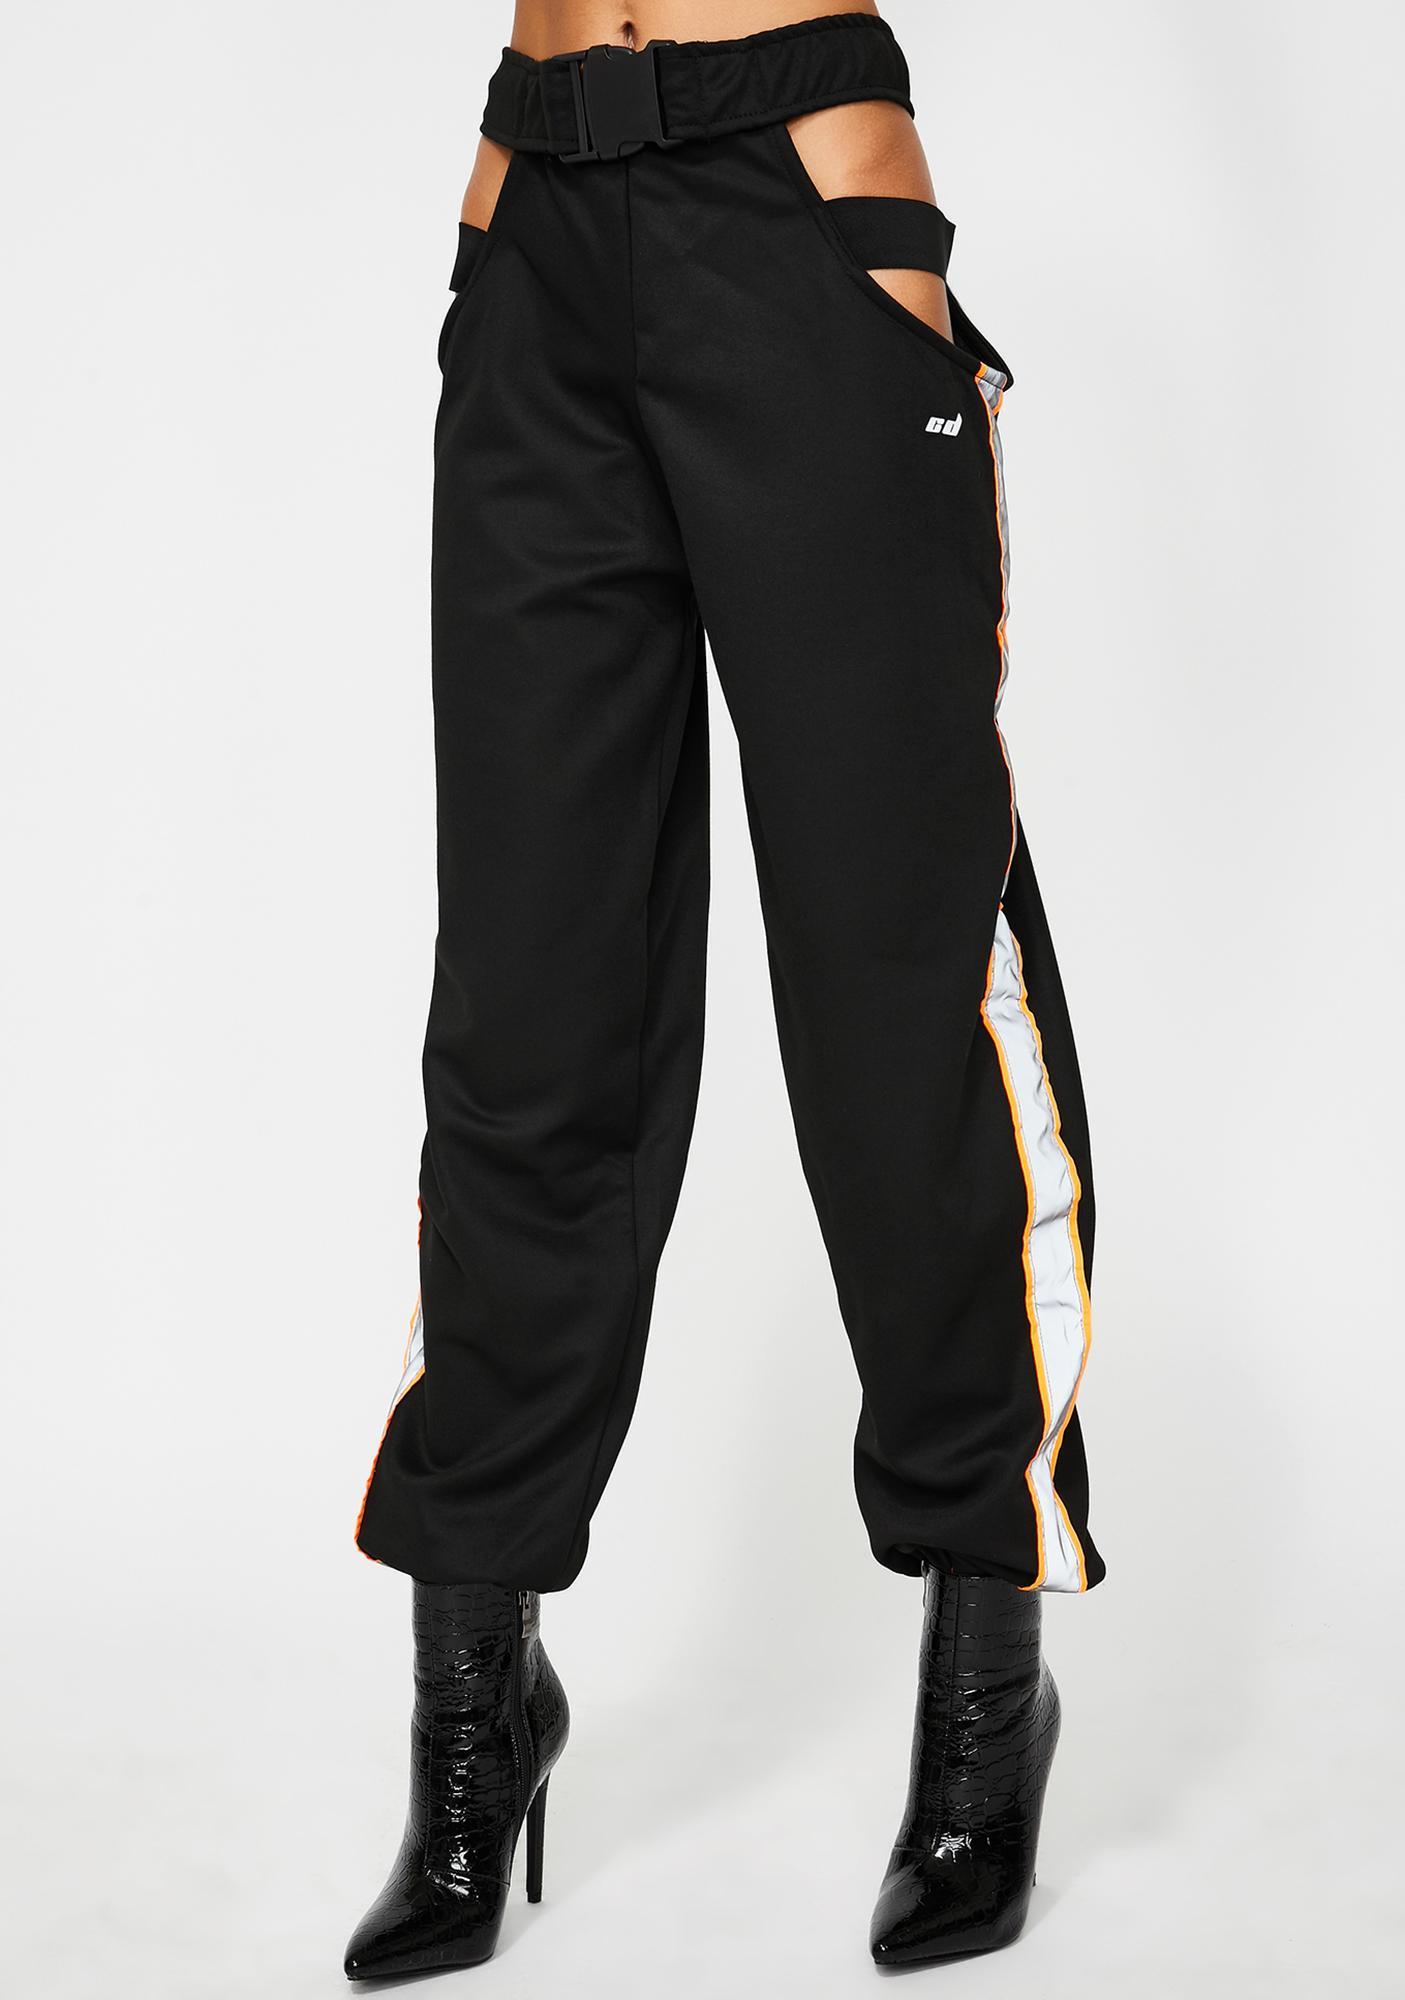 Criminal Damage Ola Reflective Cut-Out Trousers